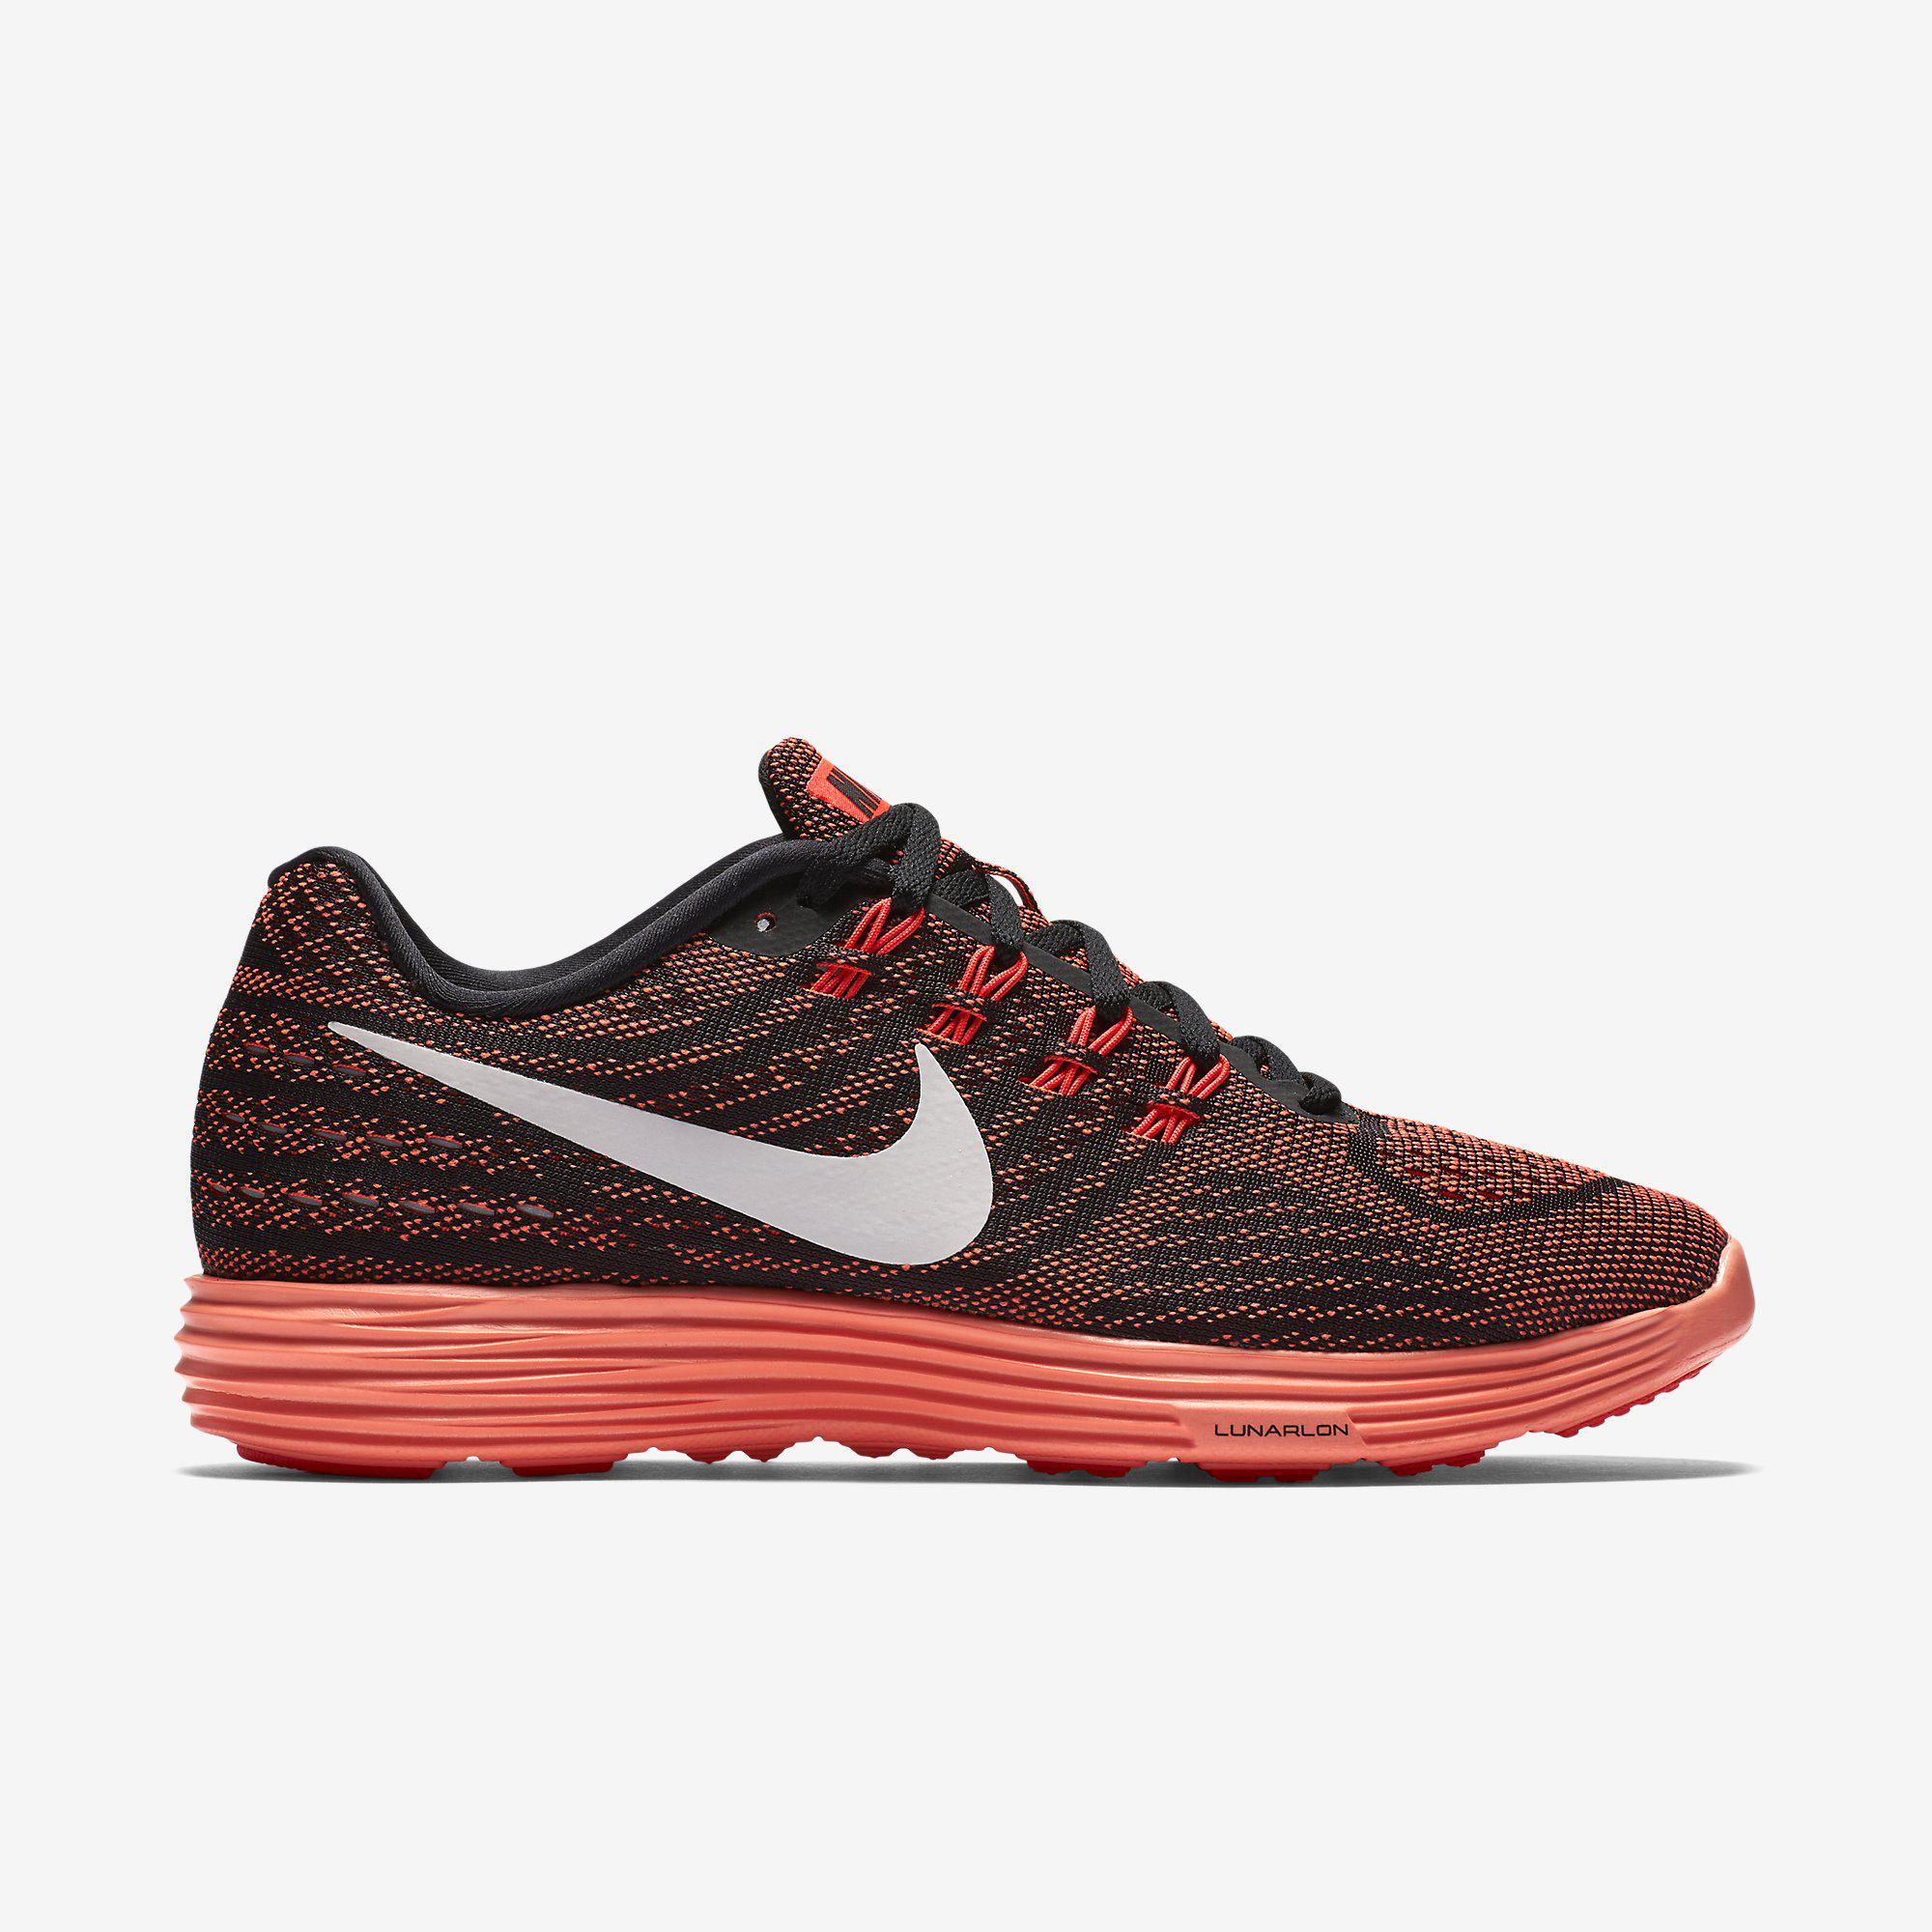 298b549e233d Nike Womens LunarTempo 2 Running Shoes - Bright Crimson Black -  Tennisnuts.com